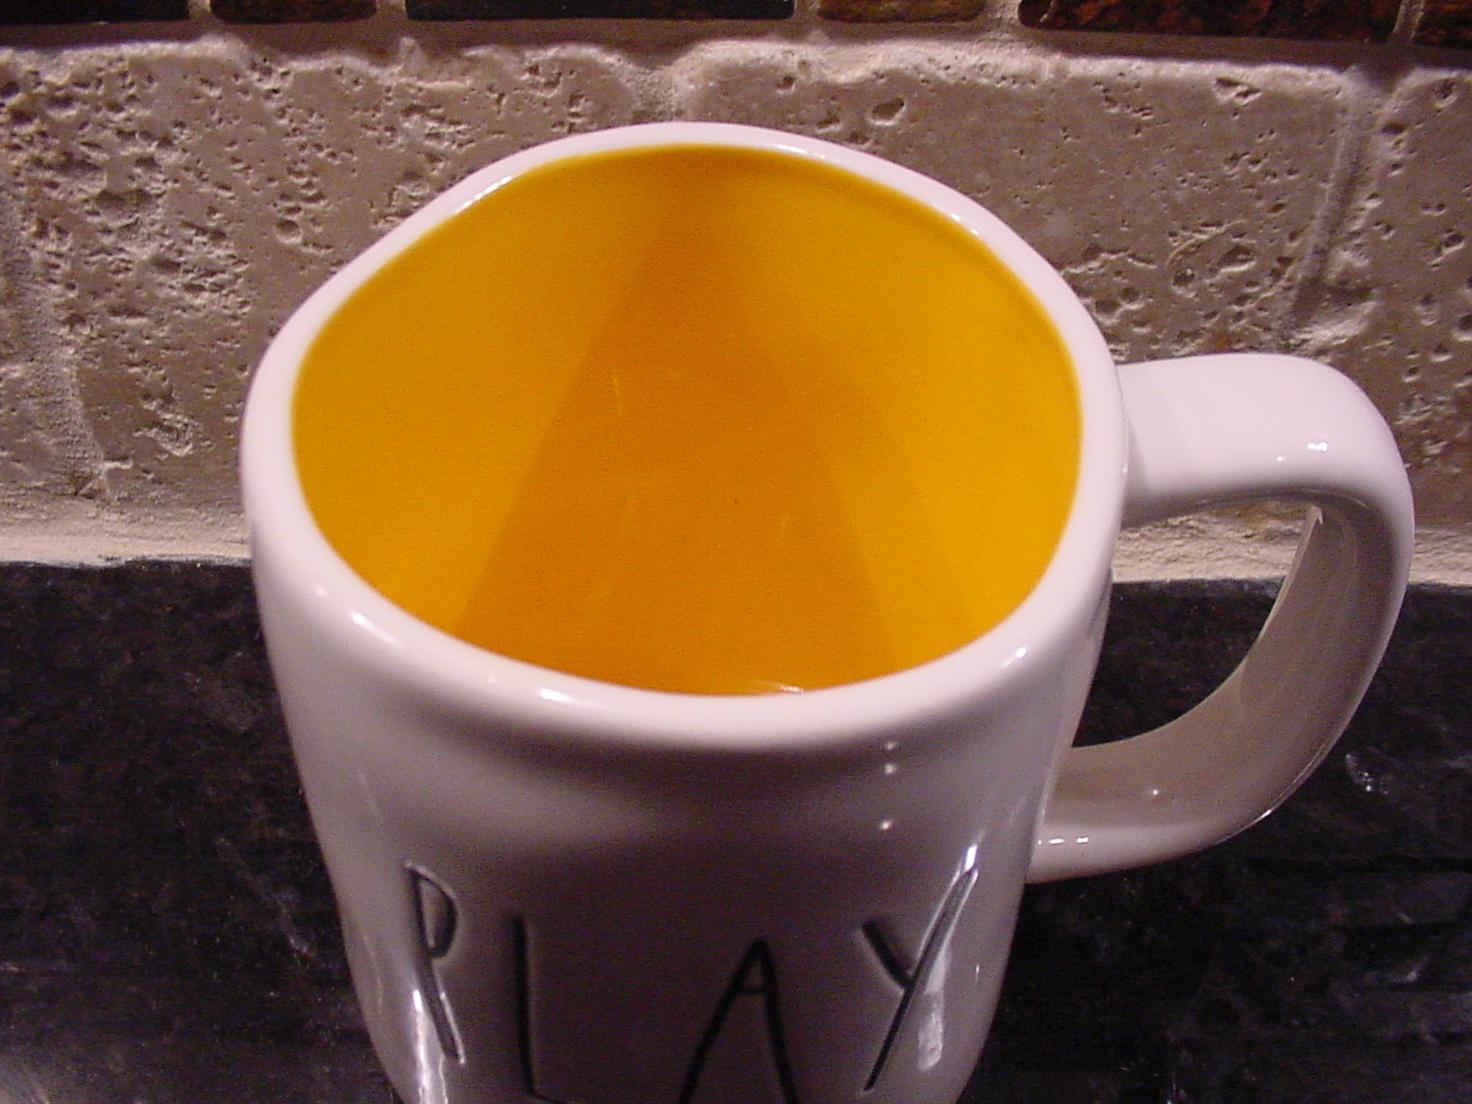 Rae Dunn PLAY Rustic Mug, Yellow Inside